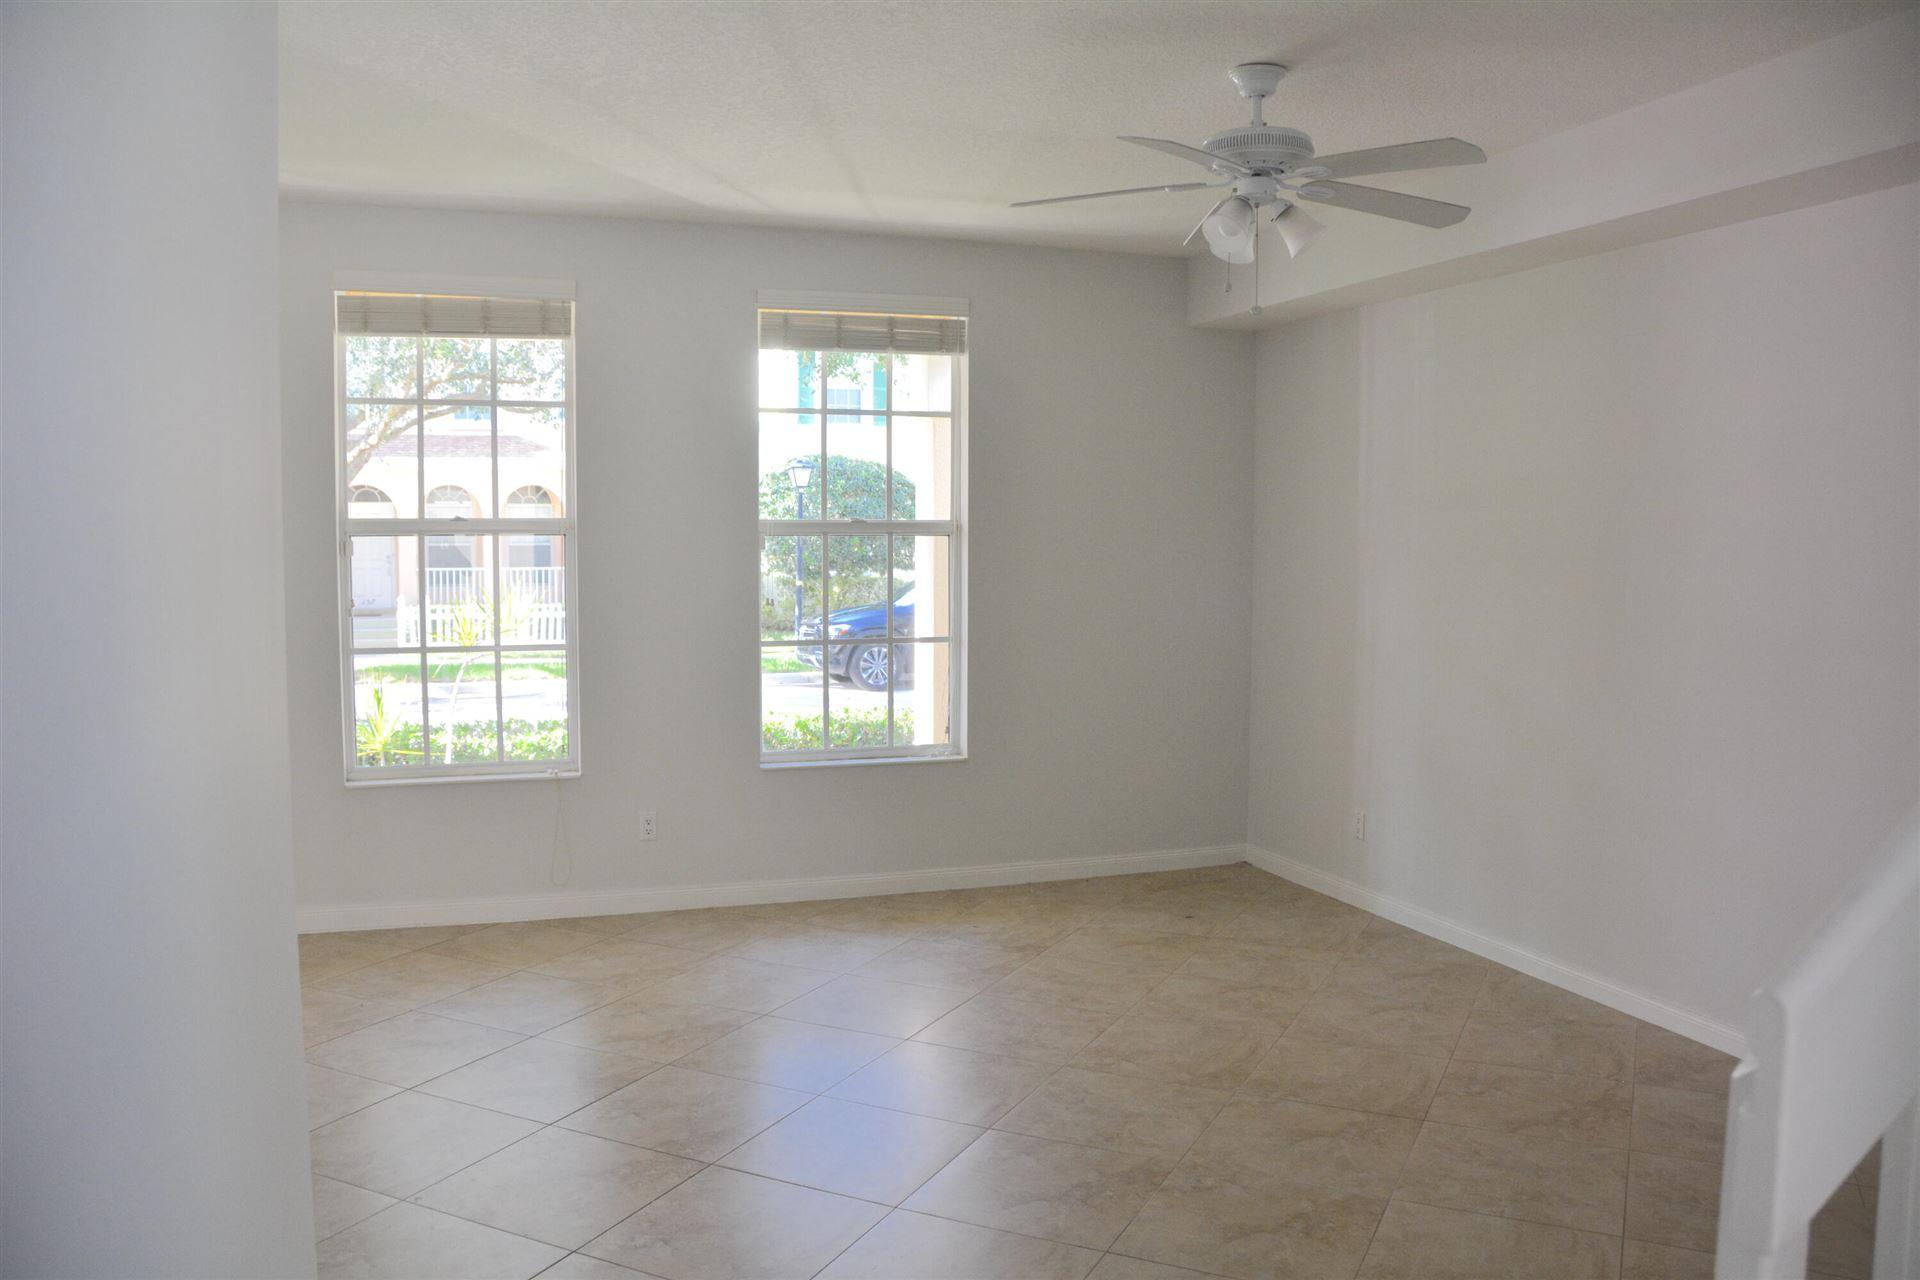 Photo of 156 Promenade Way, Jupiter, FL 33458 (MLS # RX-10732779)